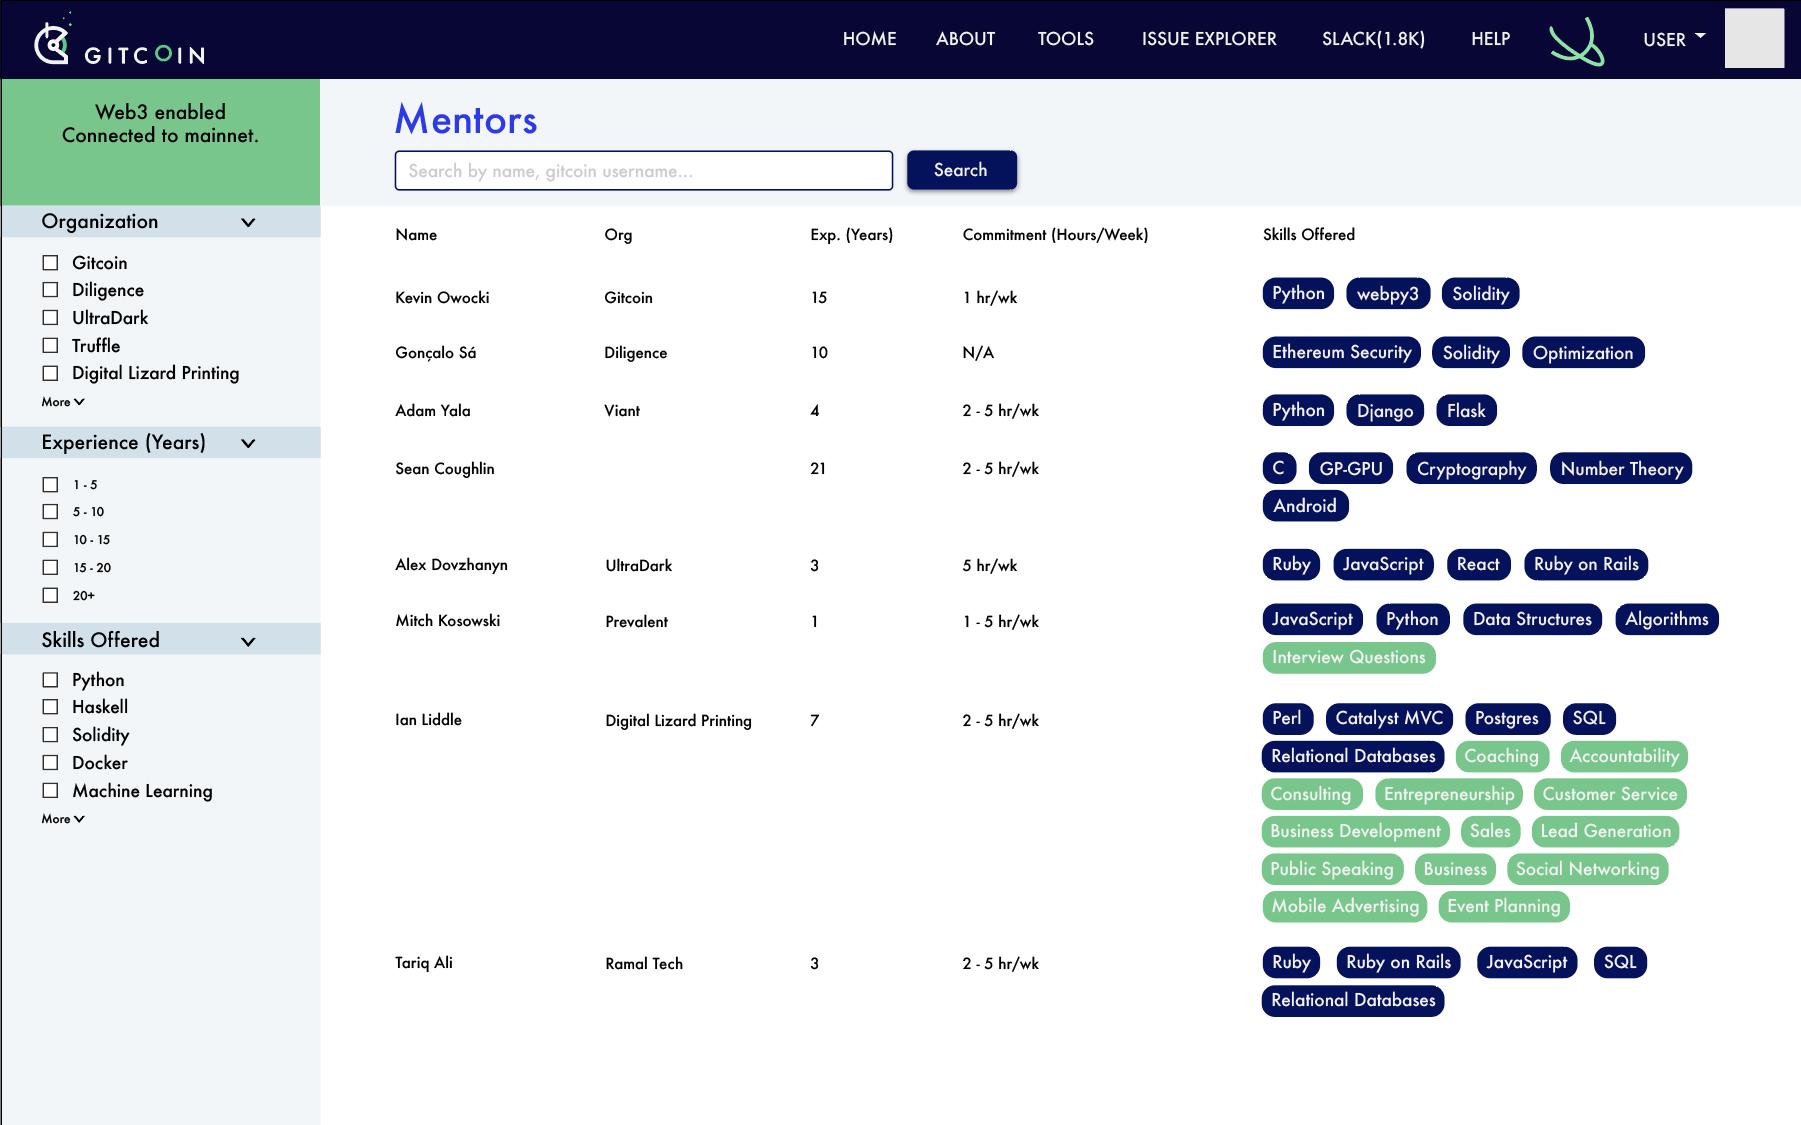 gitcoin_mentors_index